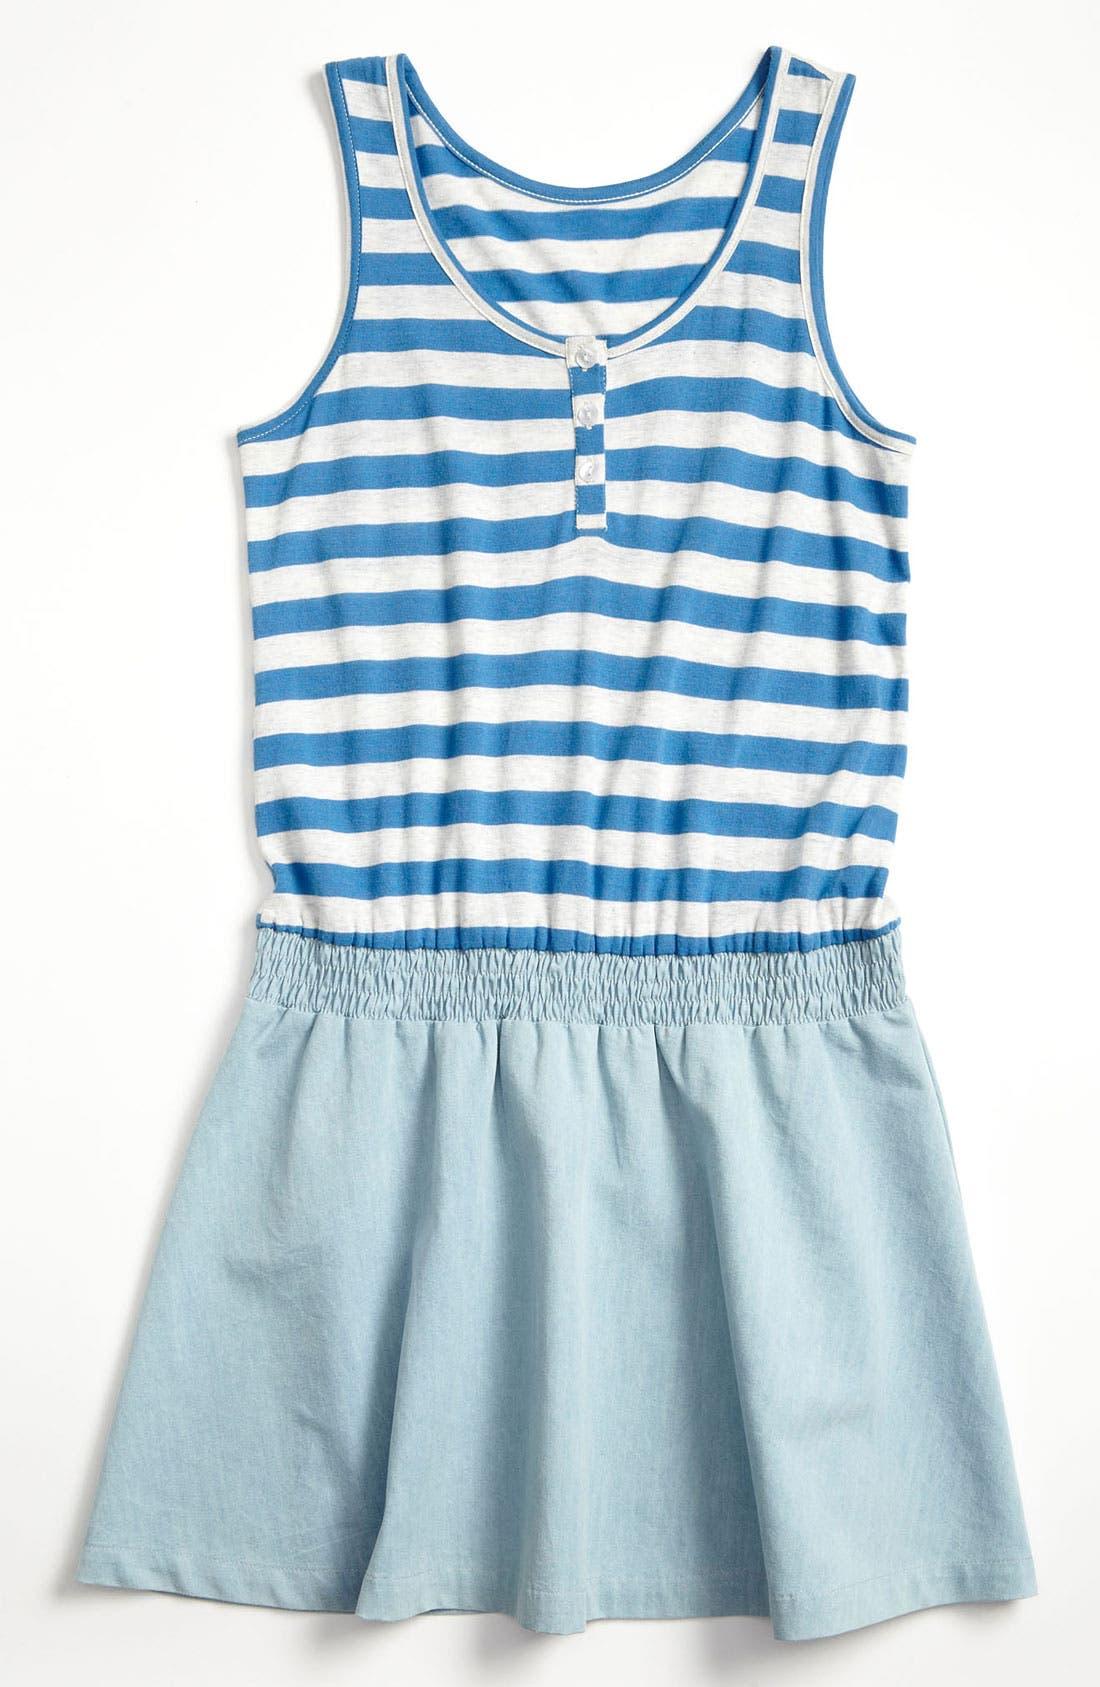 Alternate Image 1 Selected - Tucker + Tate 'Julia' Knit Dress (Big Girls)